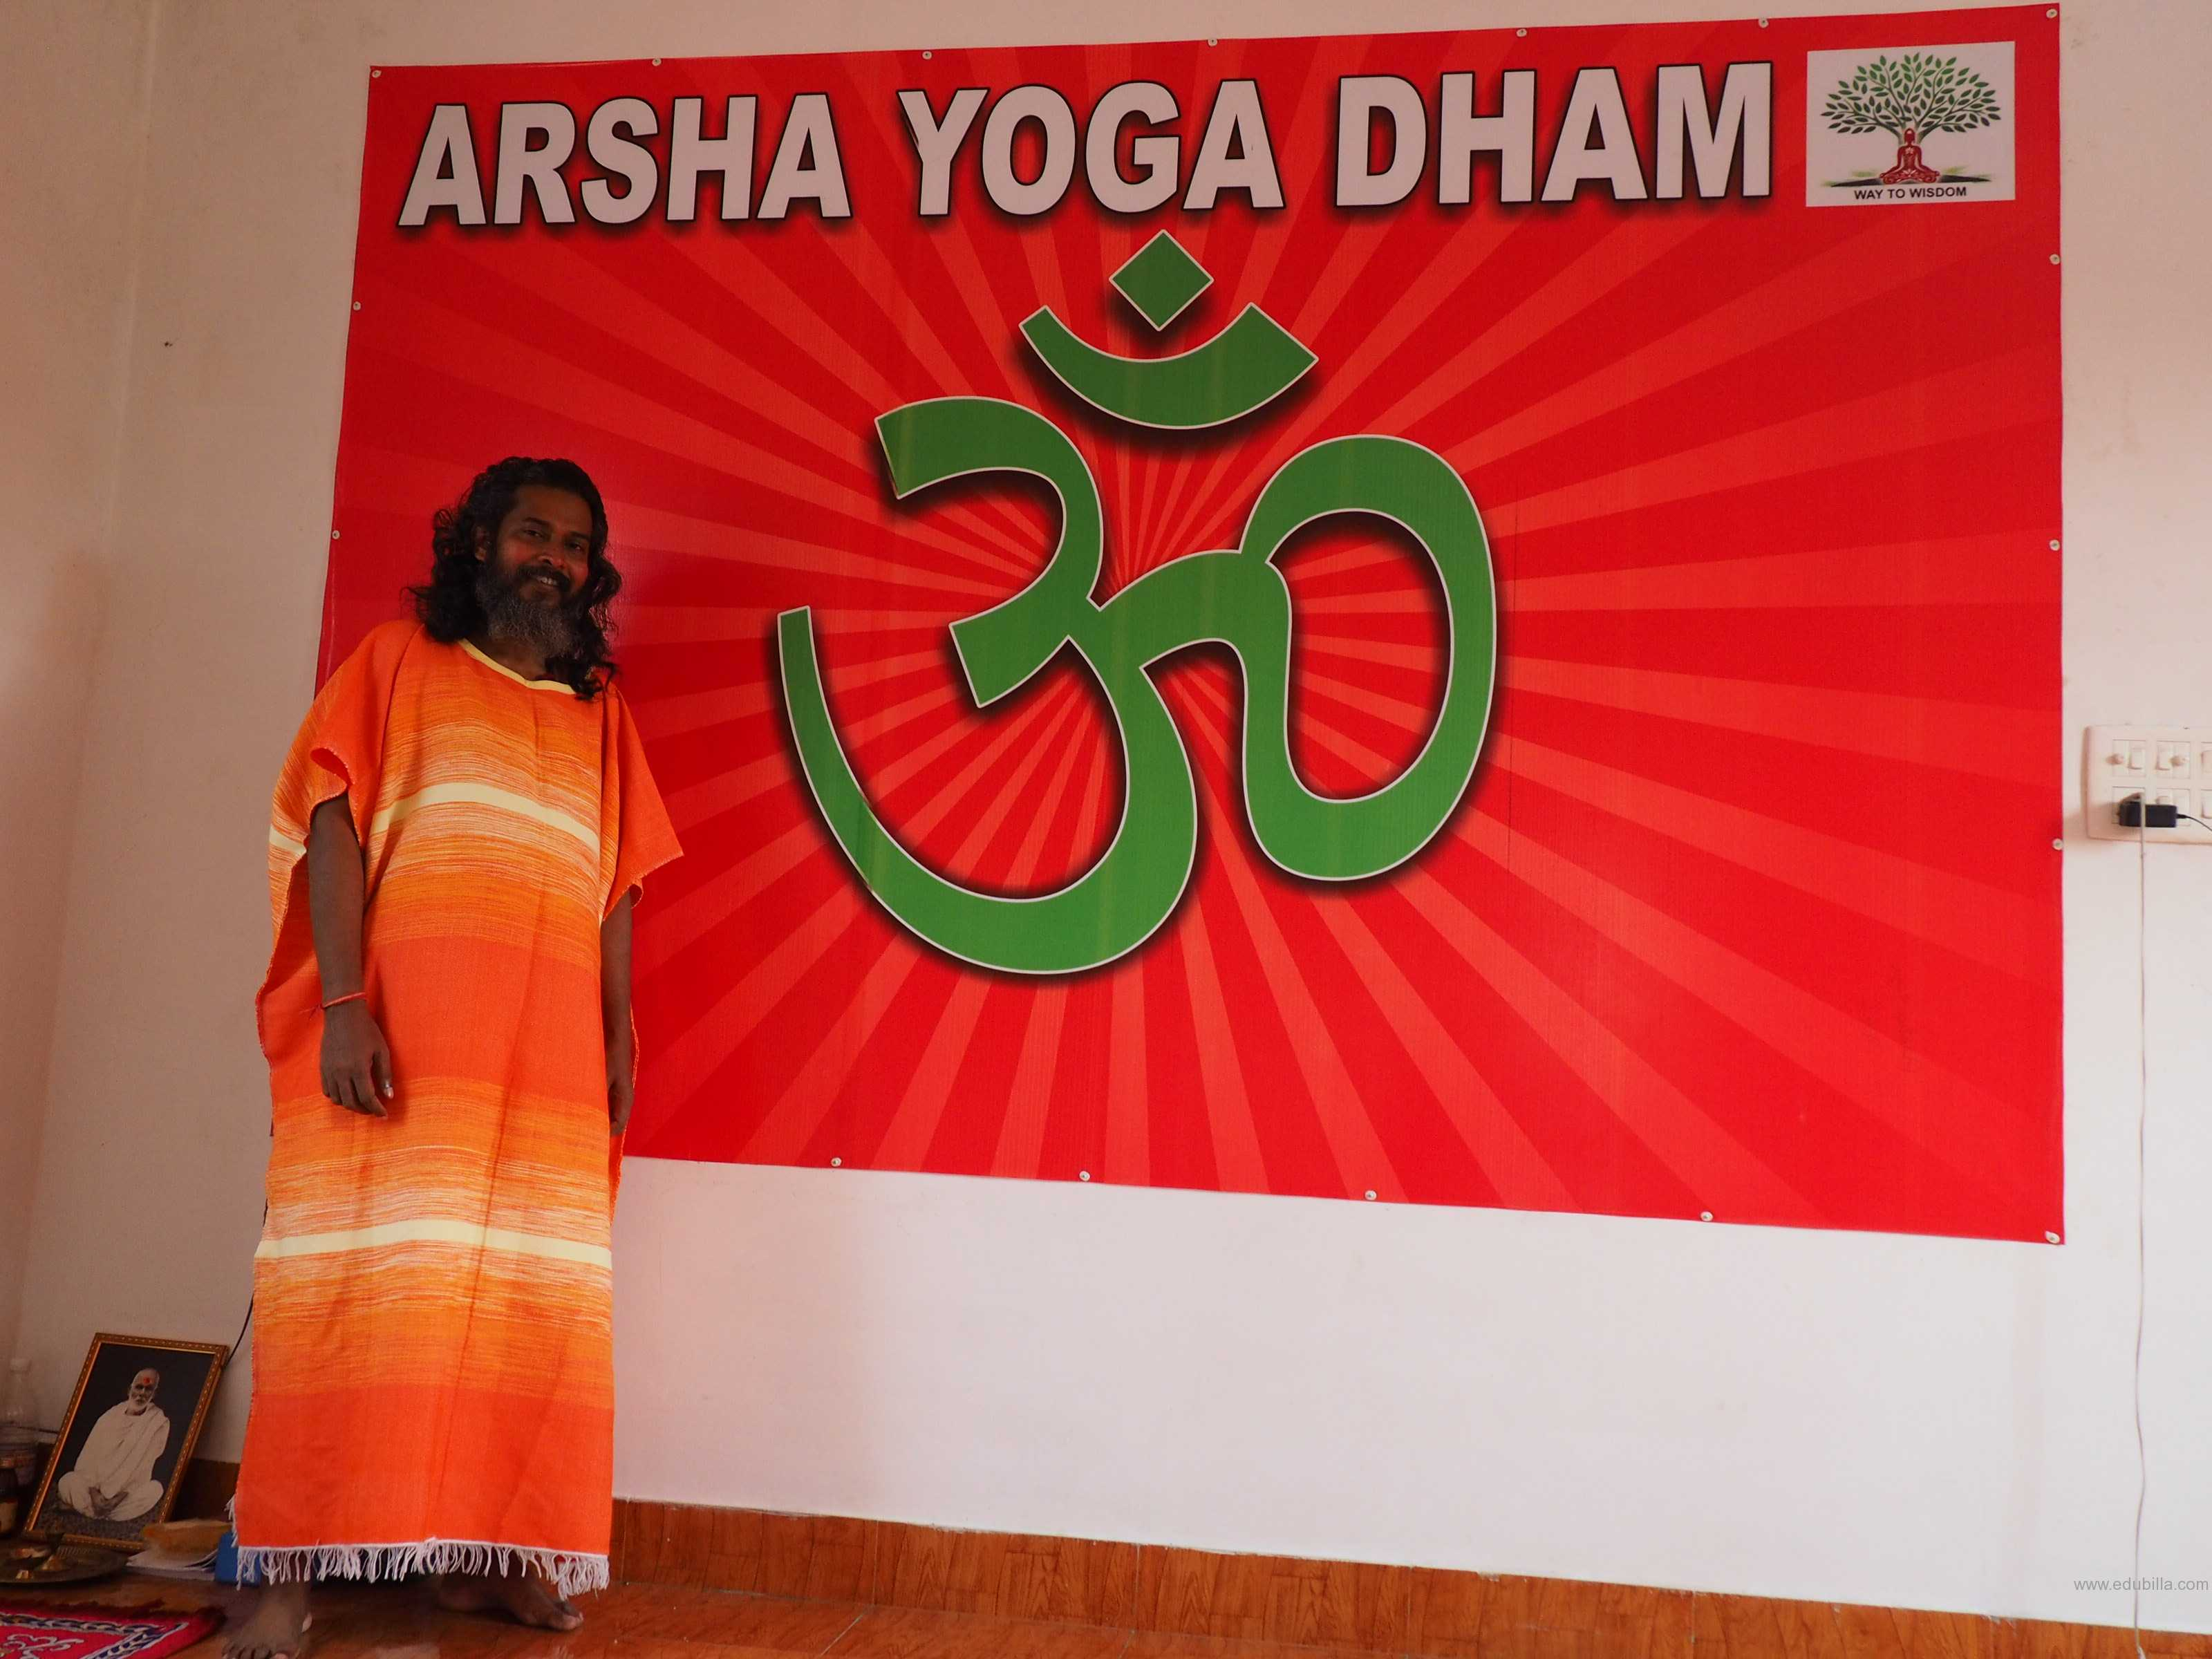 Gift Yourself the Spiritual Gift of 200 Hour Yoga Teacher Training Course